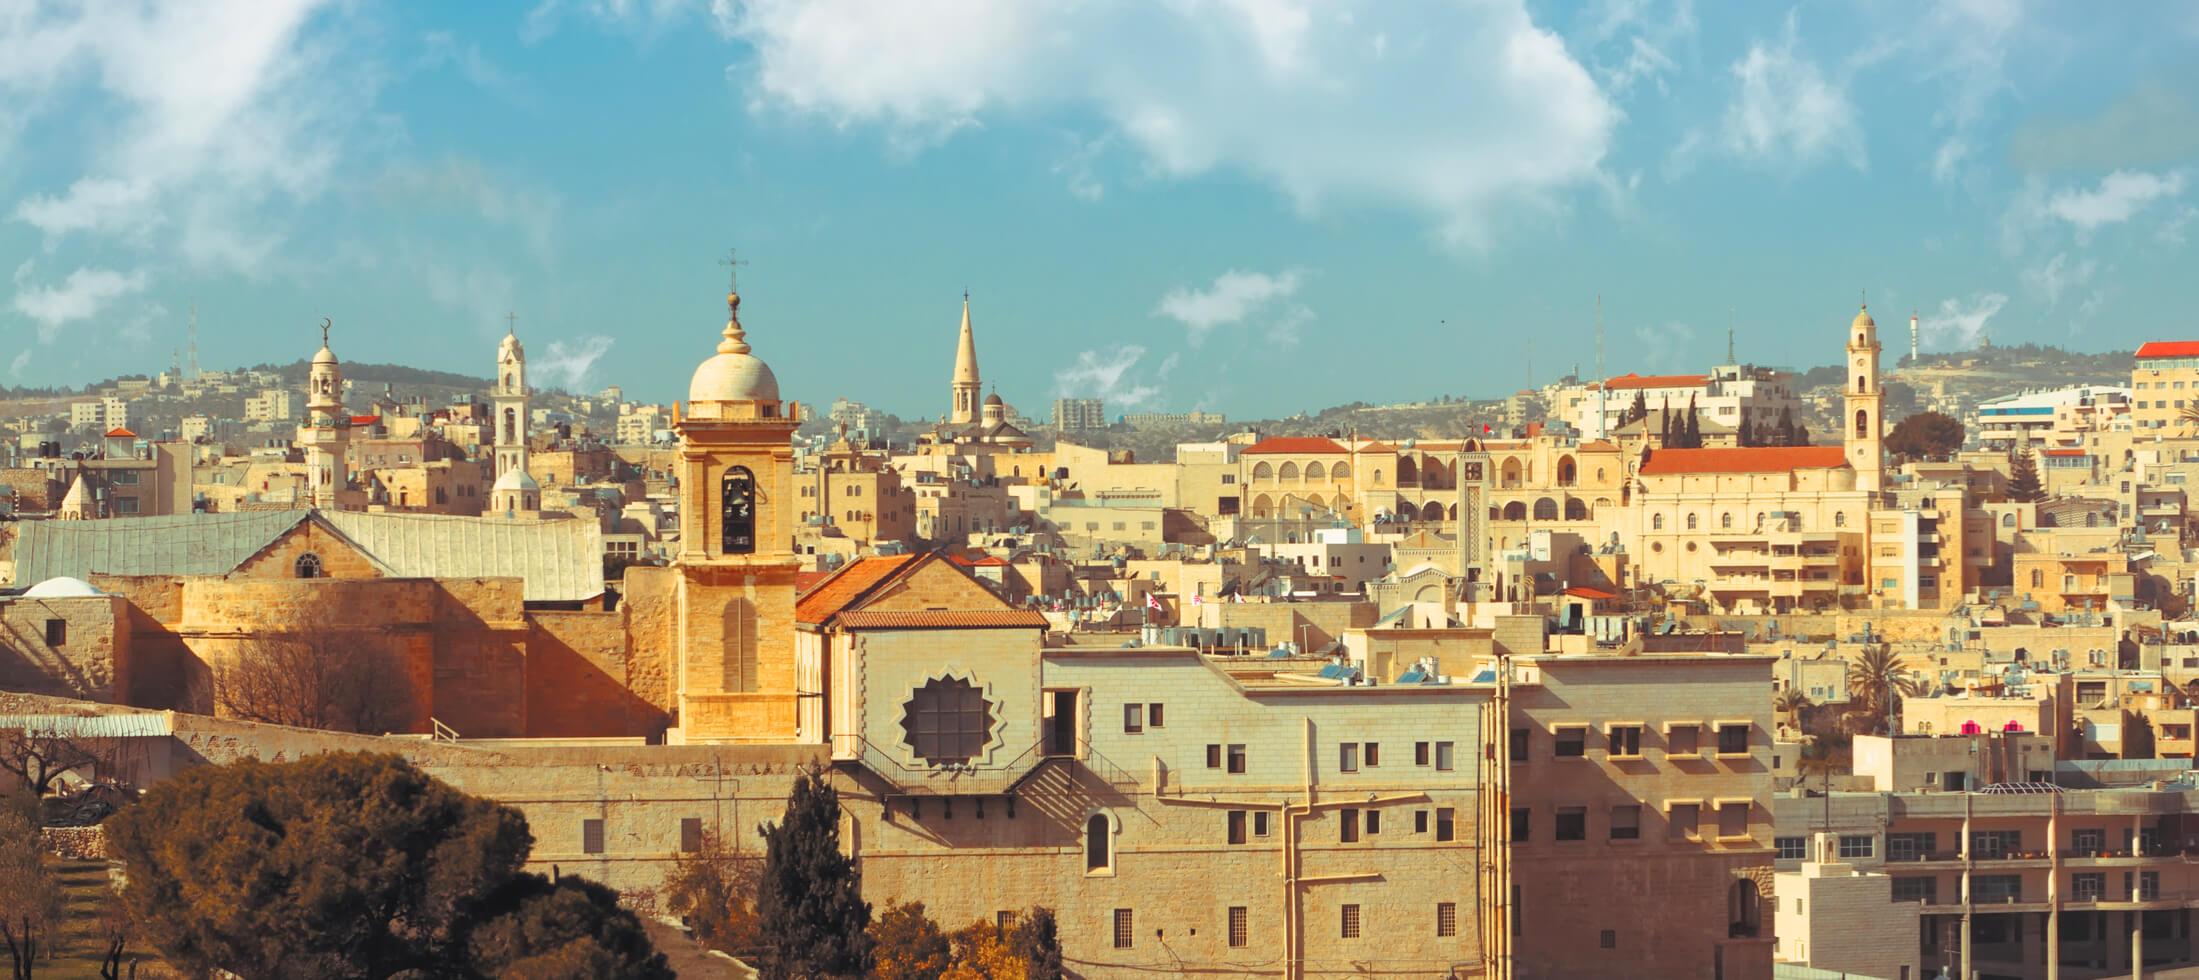 Bethlehem OId City